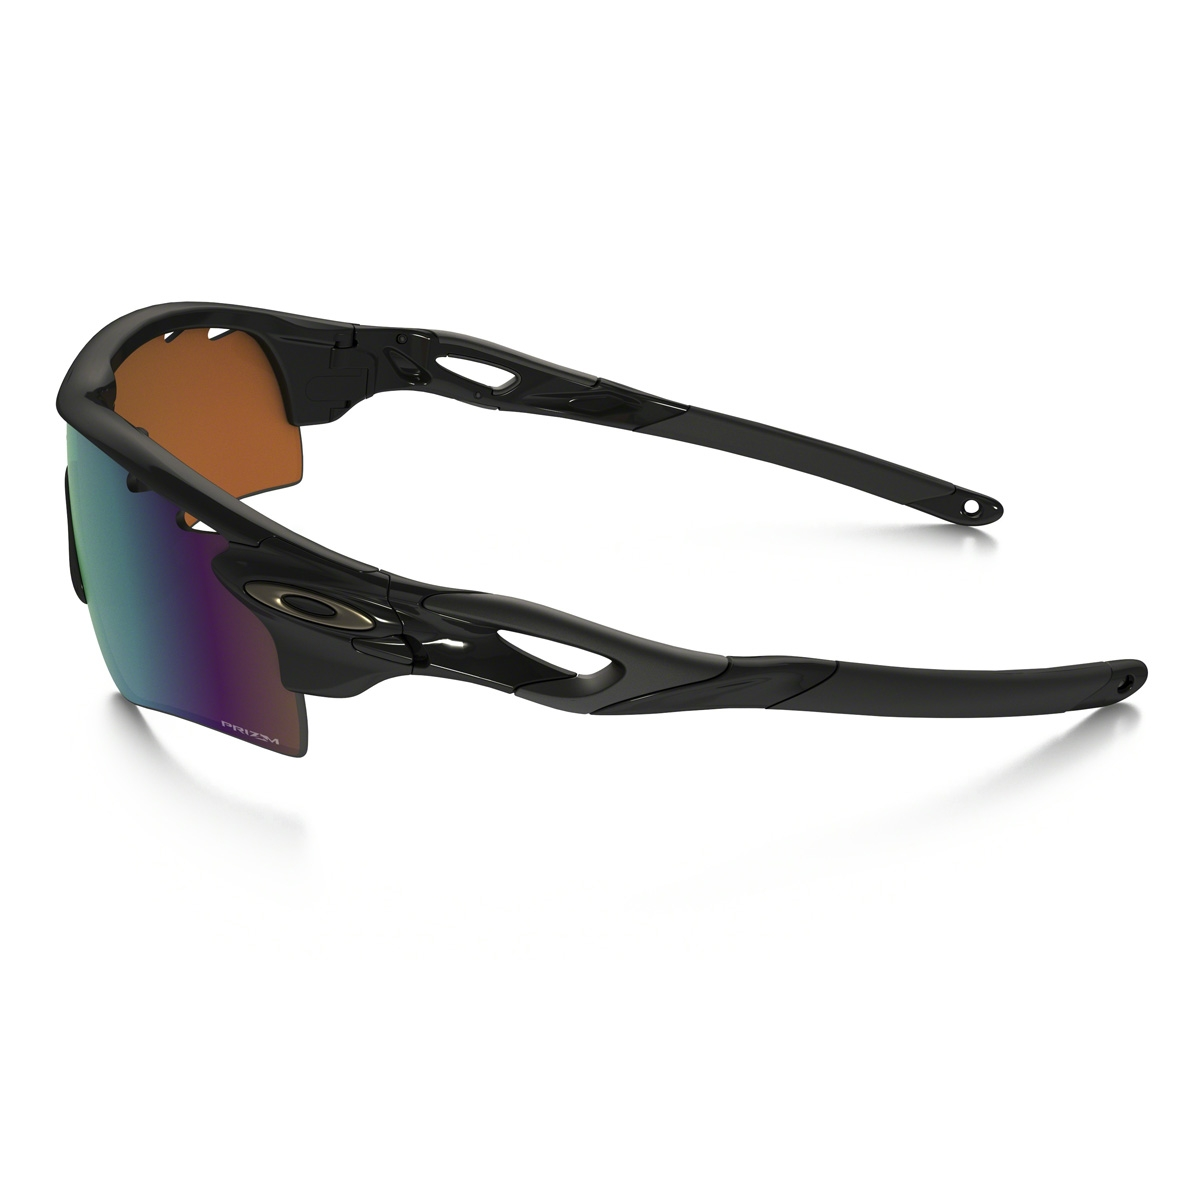 39bef83547 ... Image of Oakley Radarlock Path Array Men s Polarized Prizm Water  Sunglasses - Black Prizm Deep ...